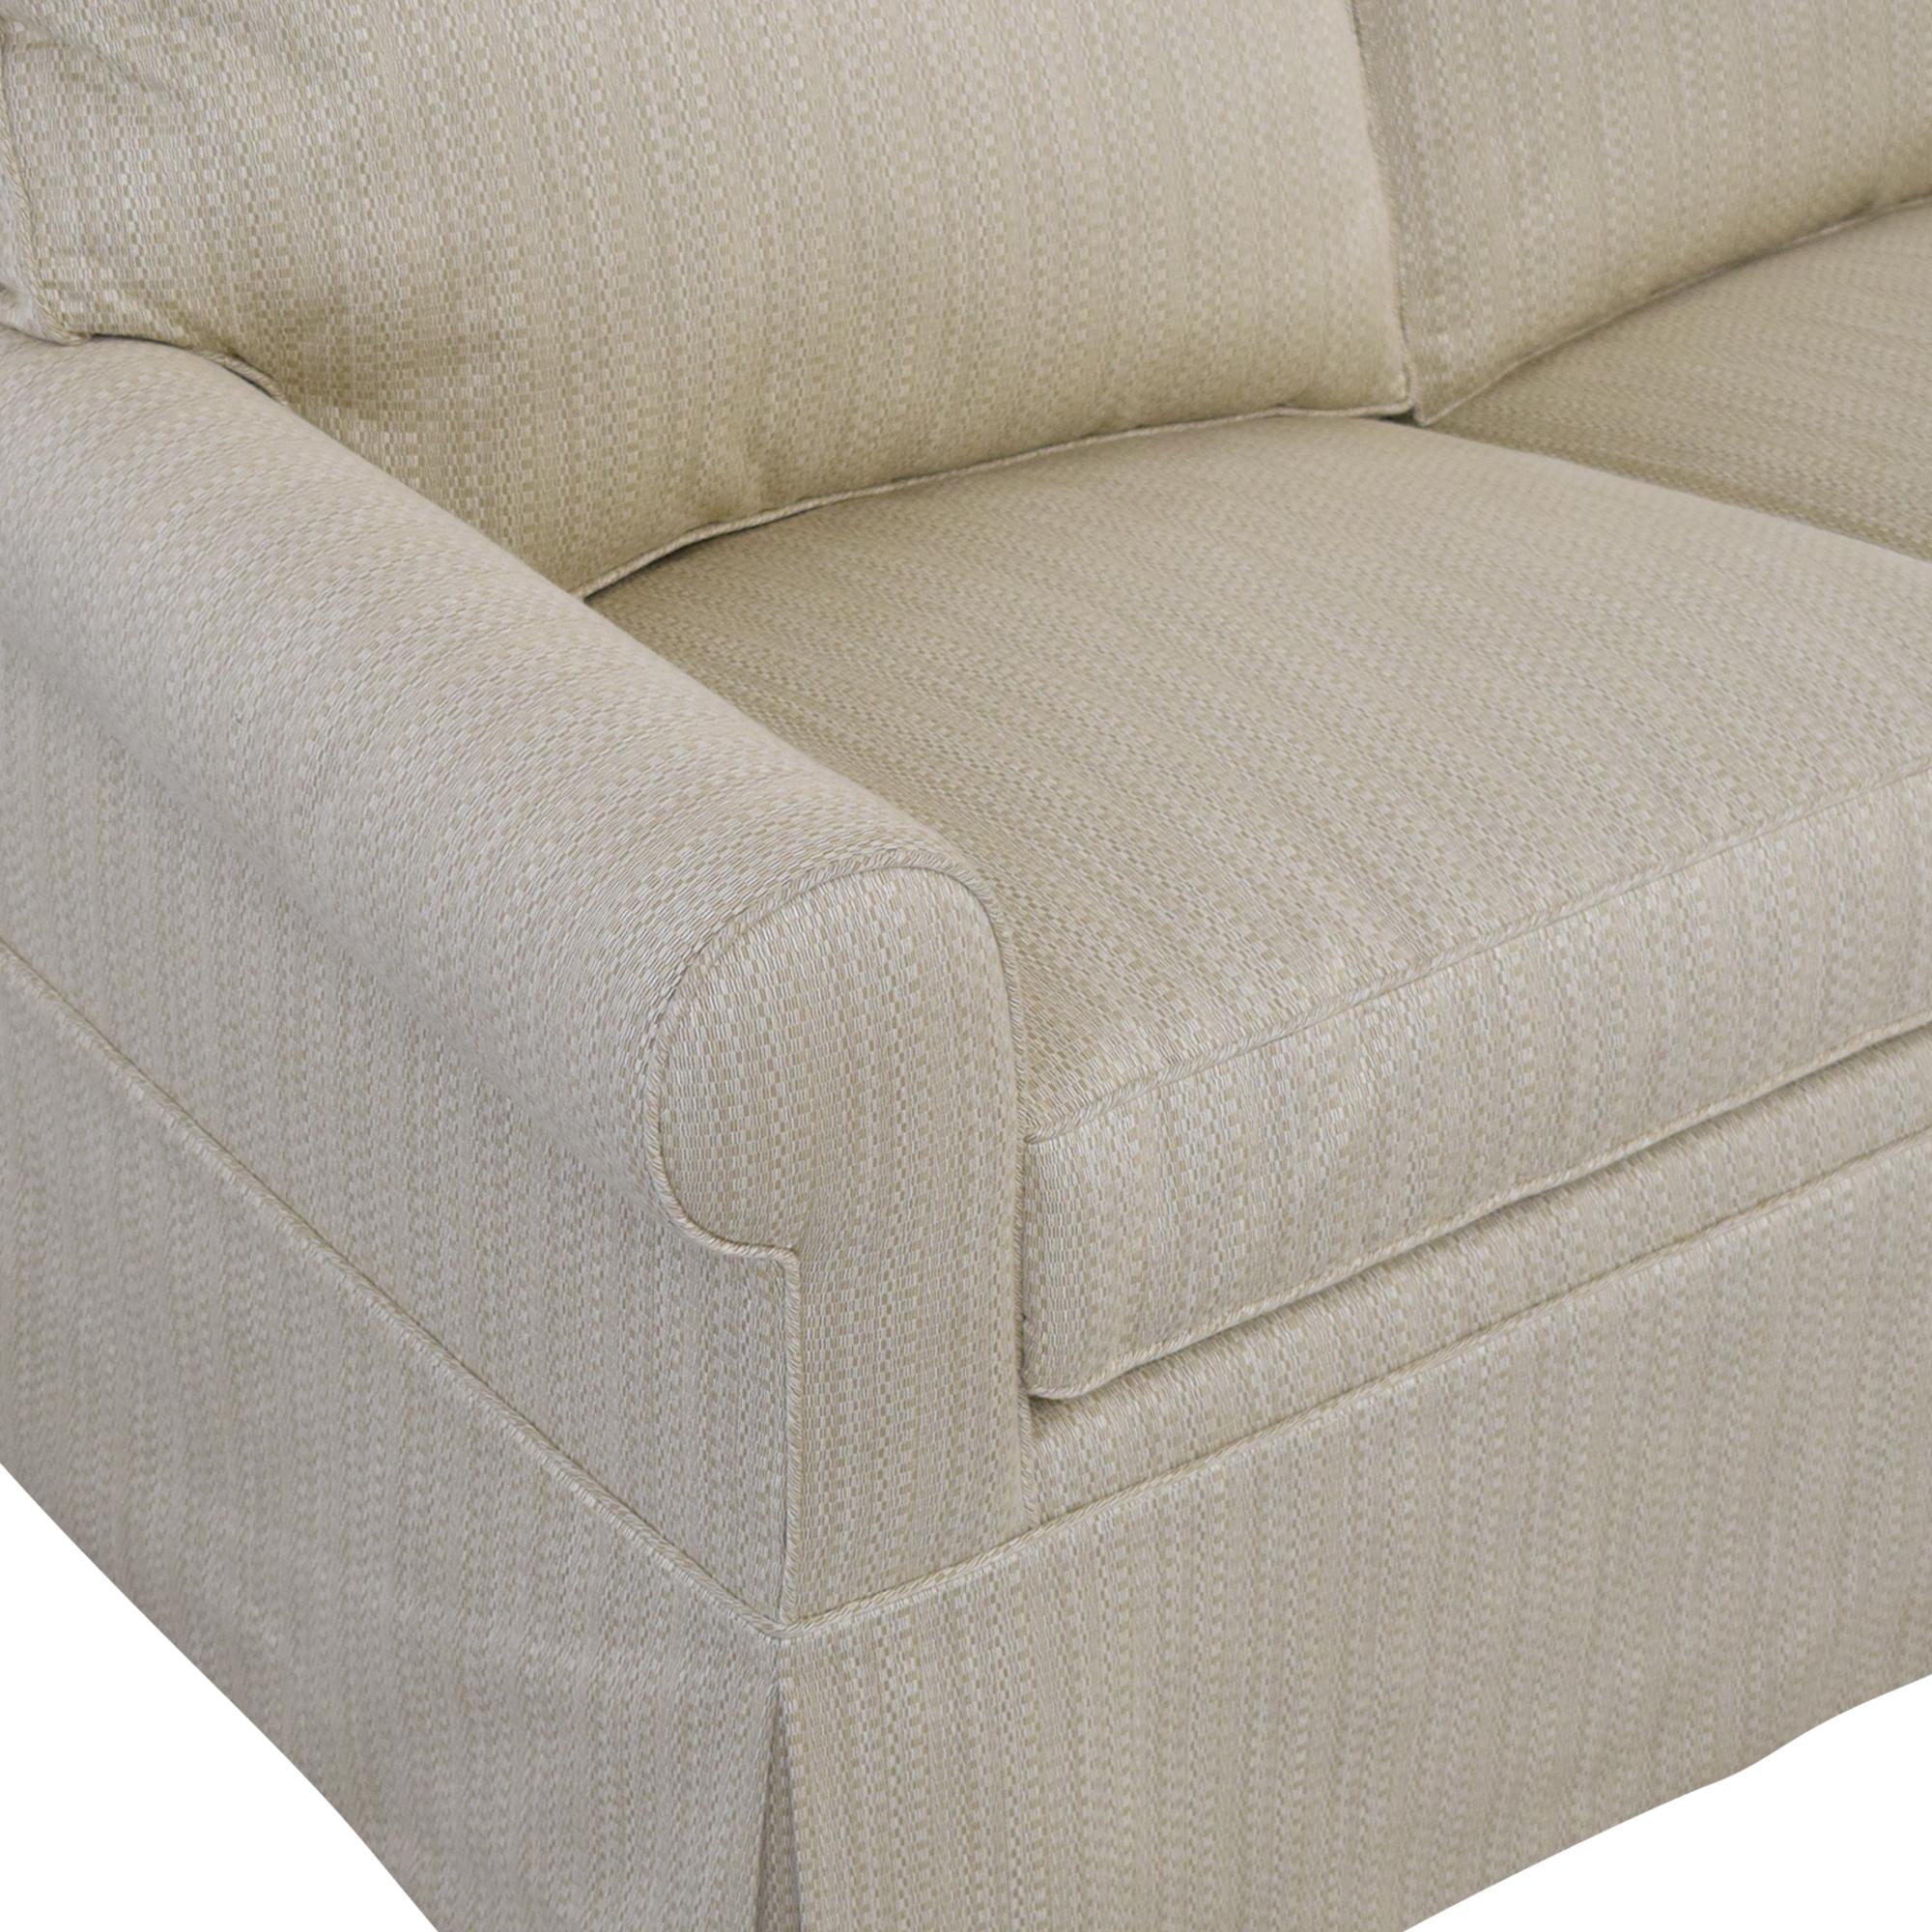 Carlyle Carlyle Sleeper Sofa discount